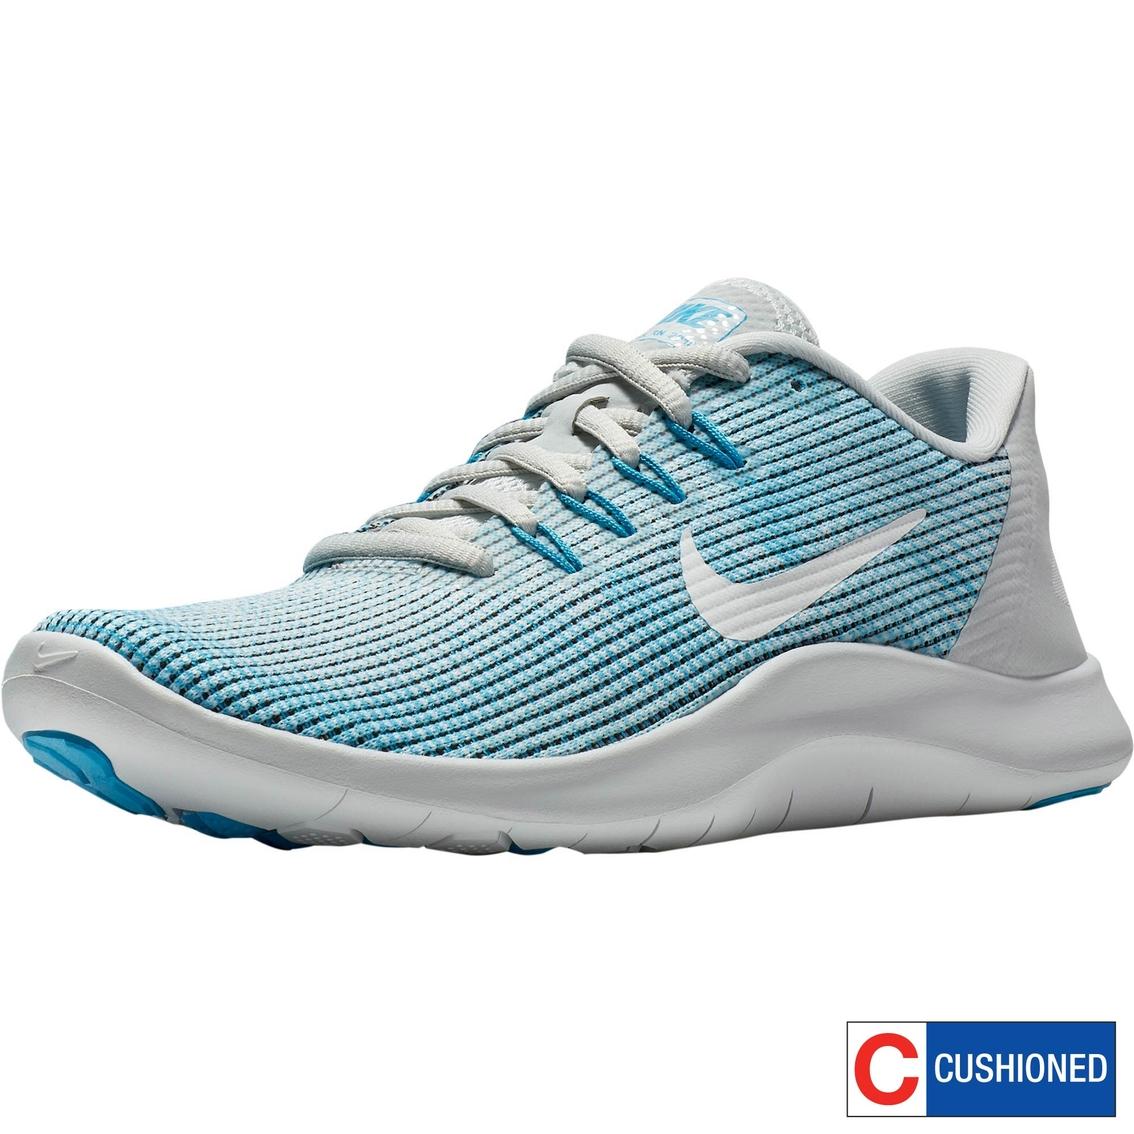 10402e3fece Nike Women s Flex Rn 2018 Running Shoes